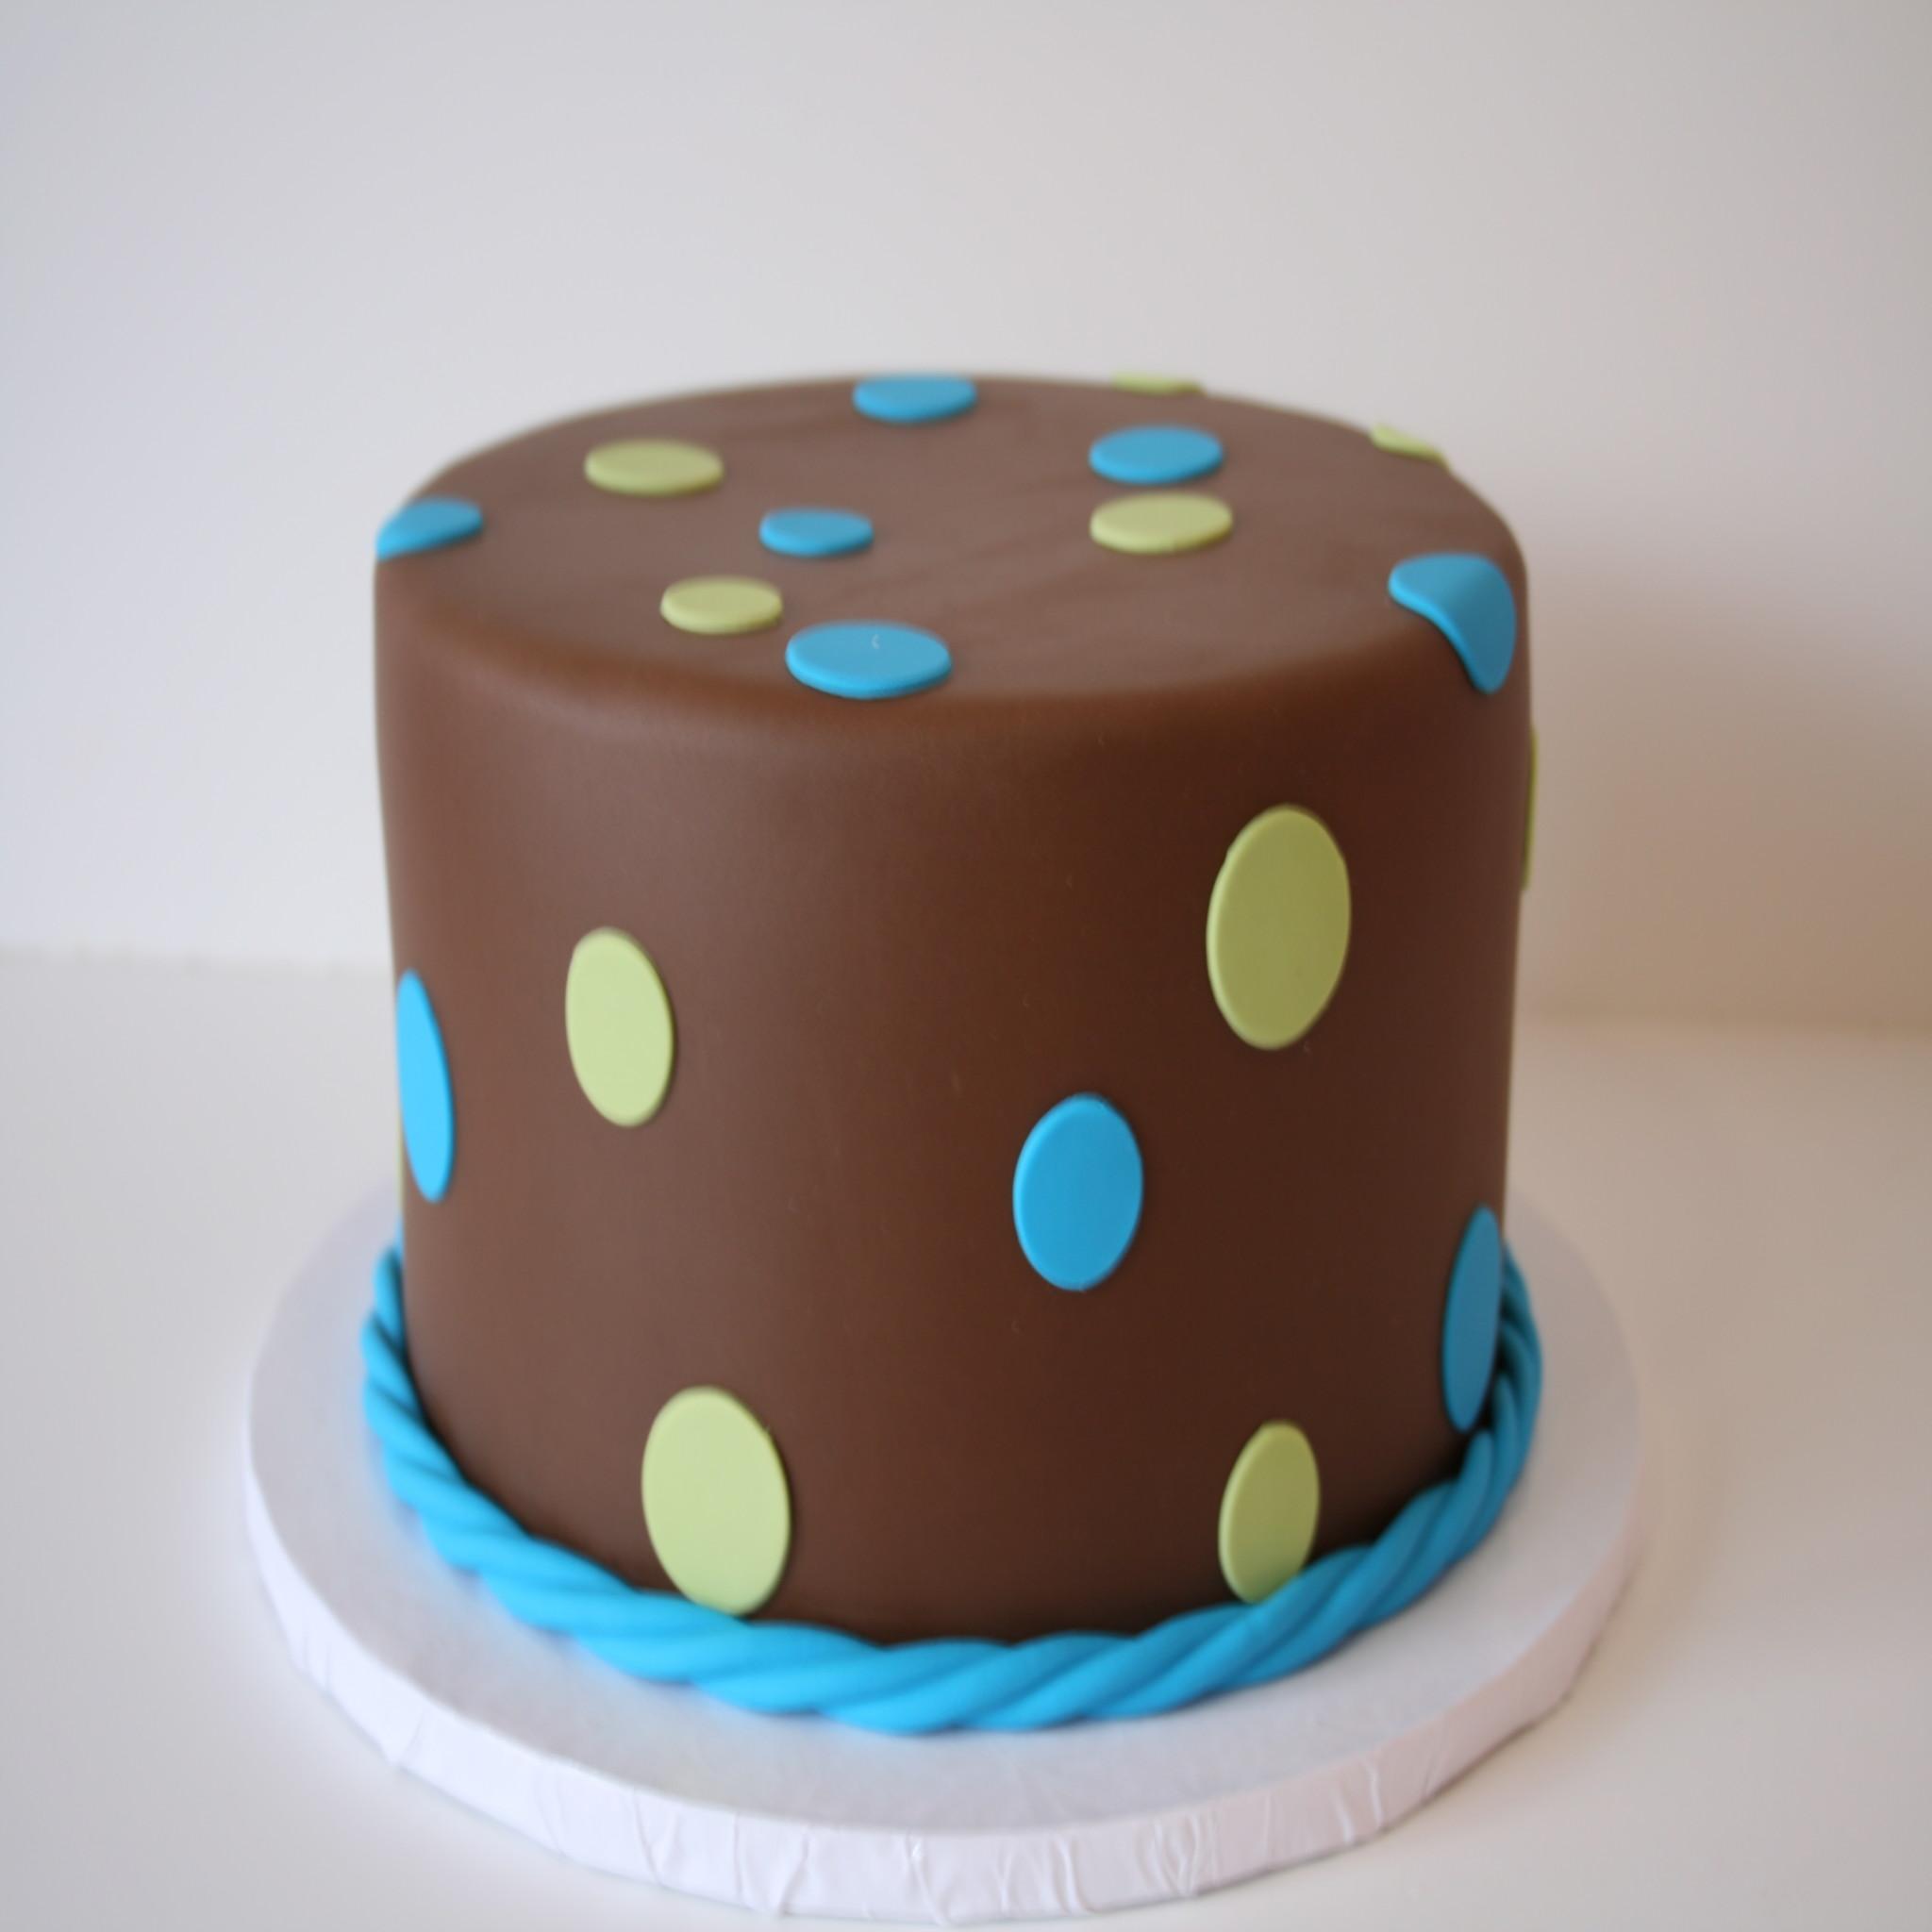 Incredible 13 No Boys Birthday Cakes Photo Boys Birthday Cake Ideas Boy Personalised Birthday Cards Veneteletsinfo